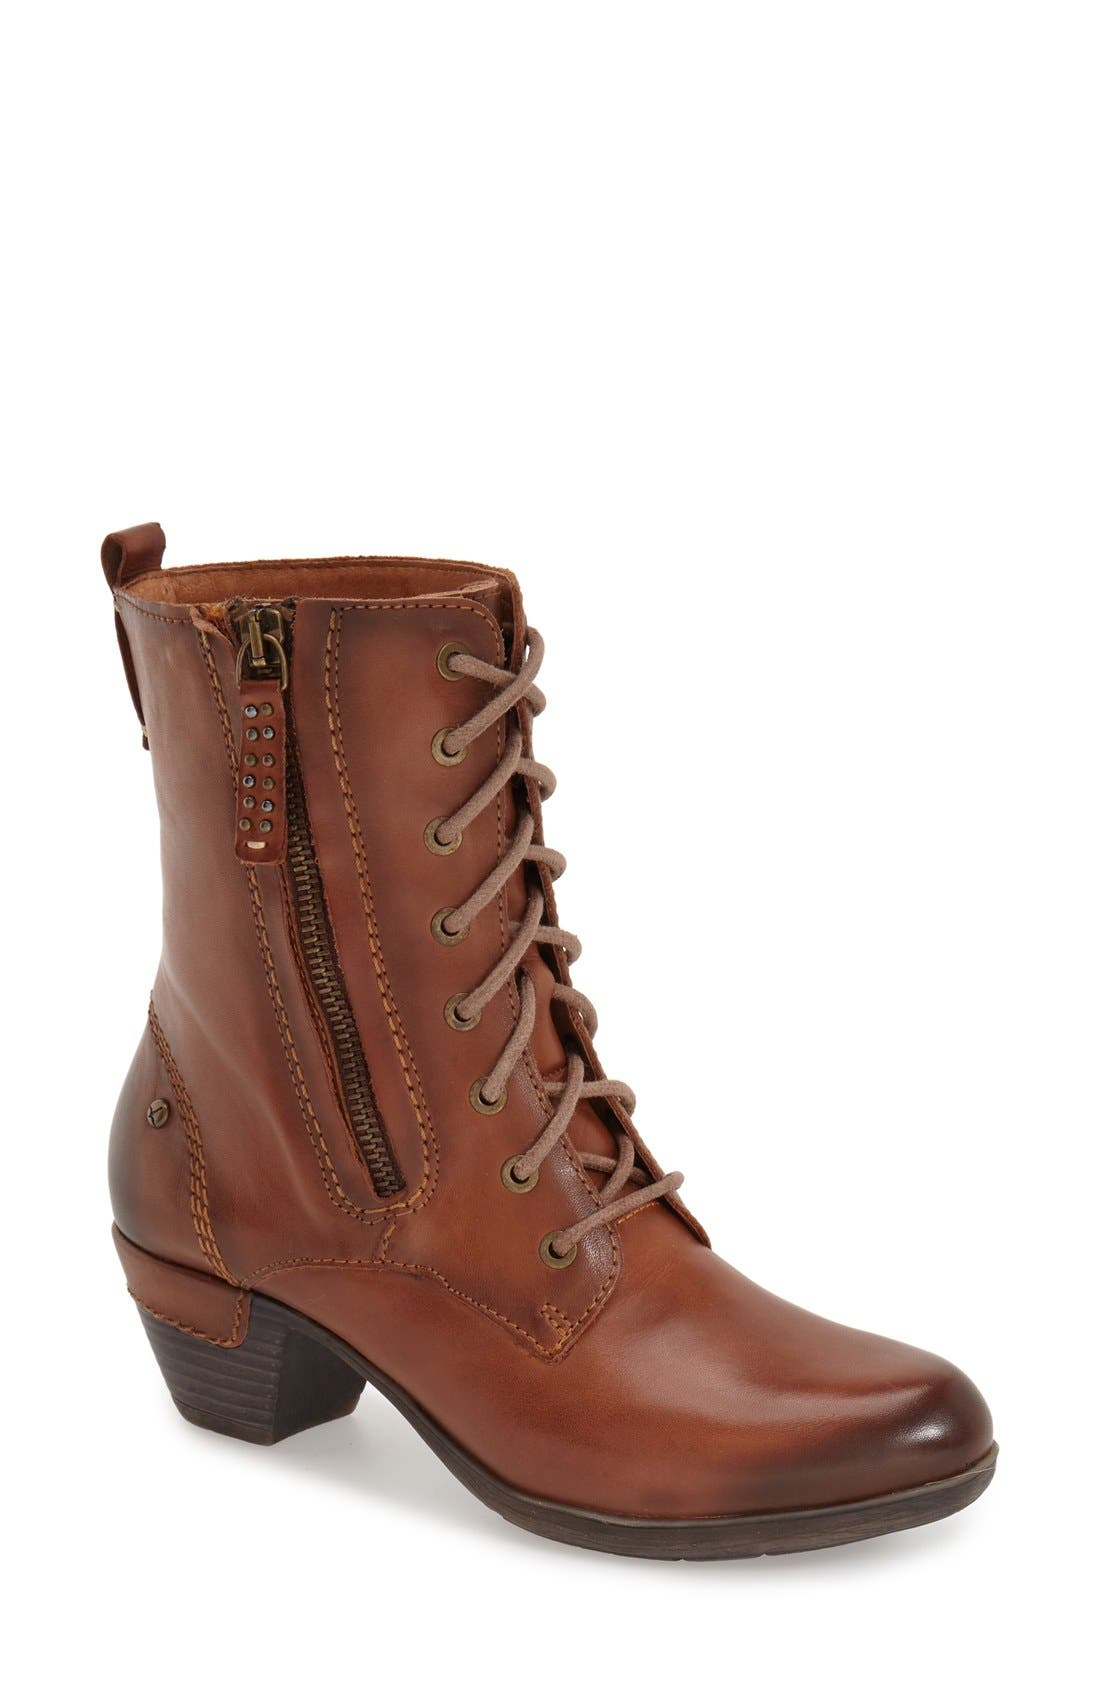 Main Image - PIKOLINOS 'Rotterdam' Lace-Up Boot (Women)